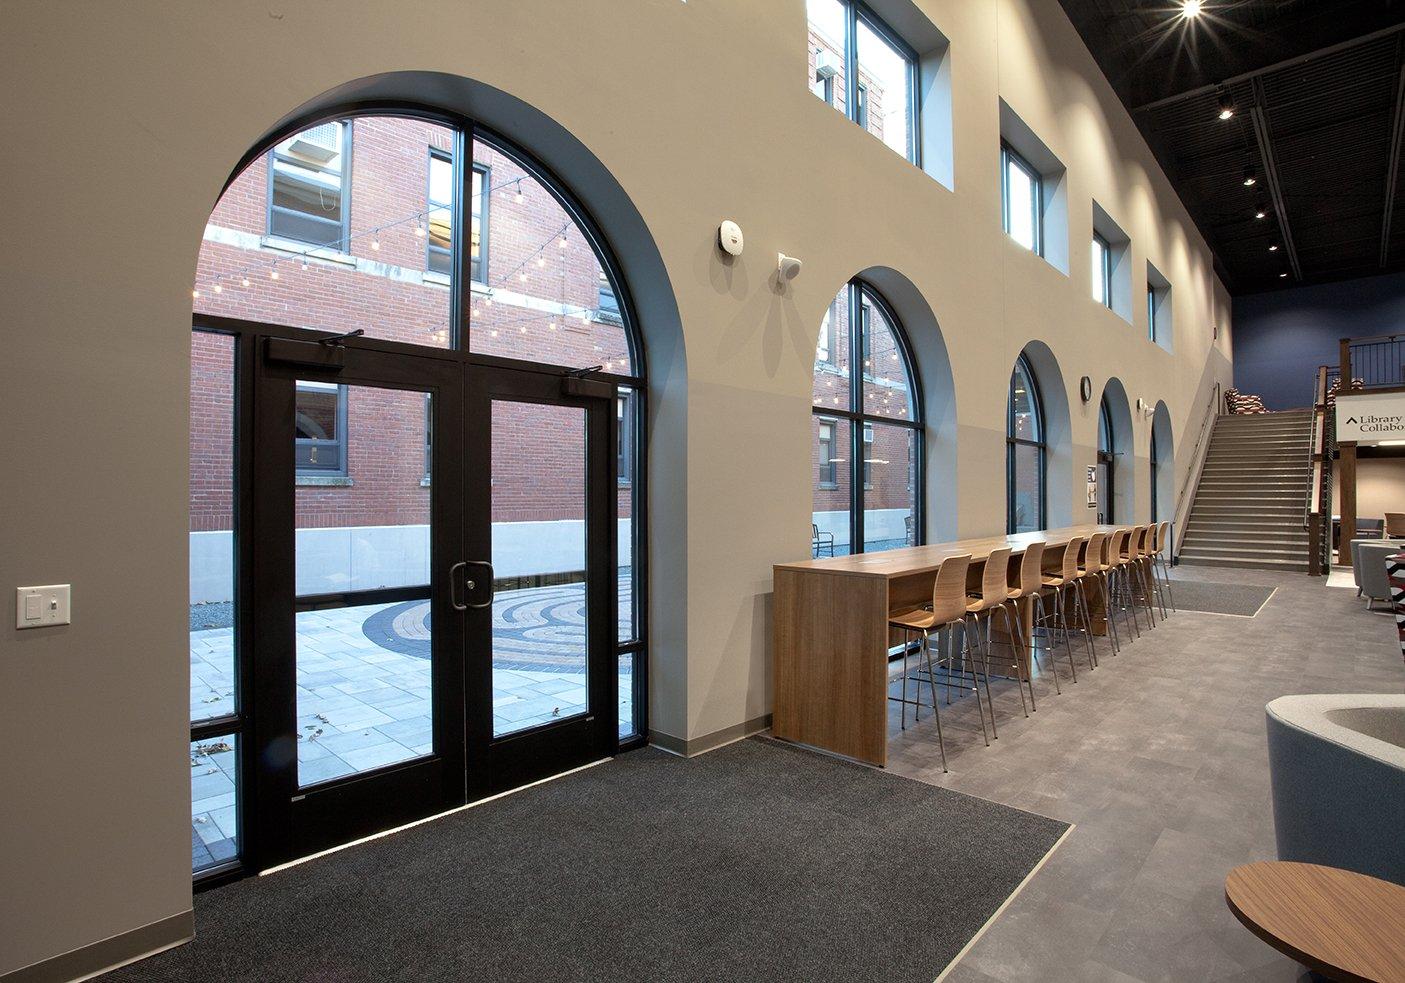 benet-academy-st-daniel-hall-8-lo